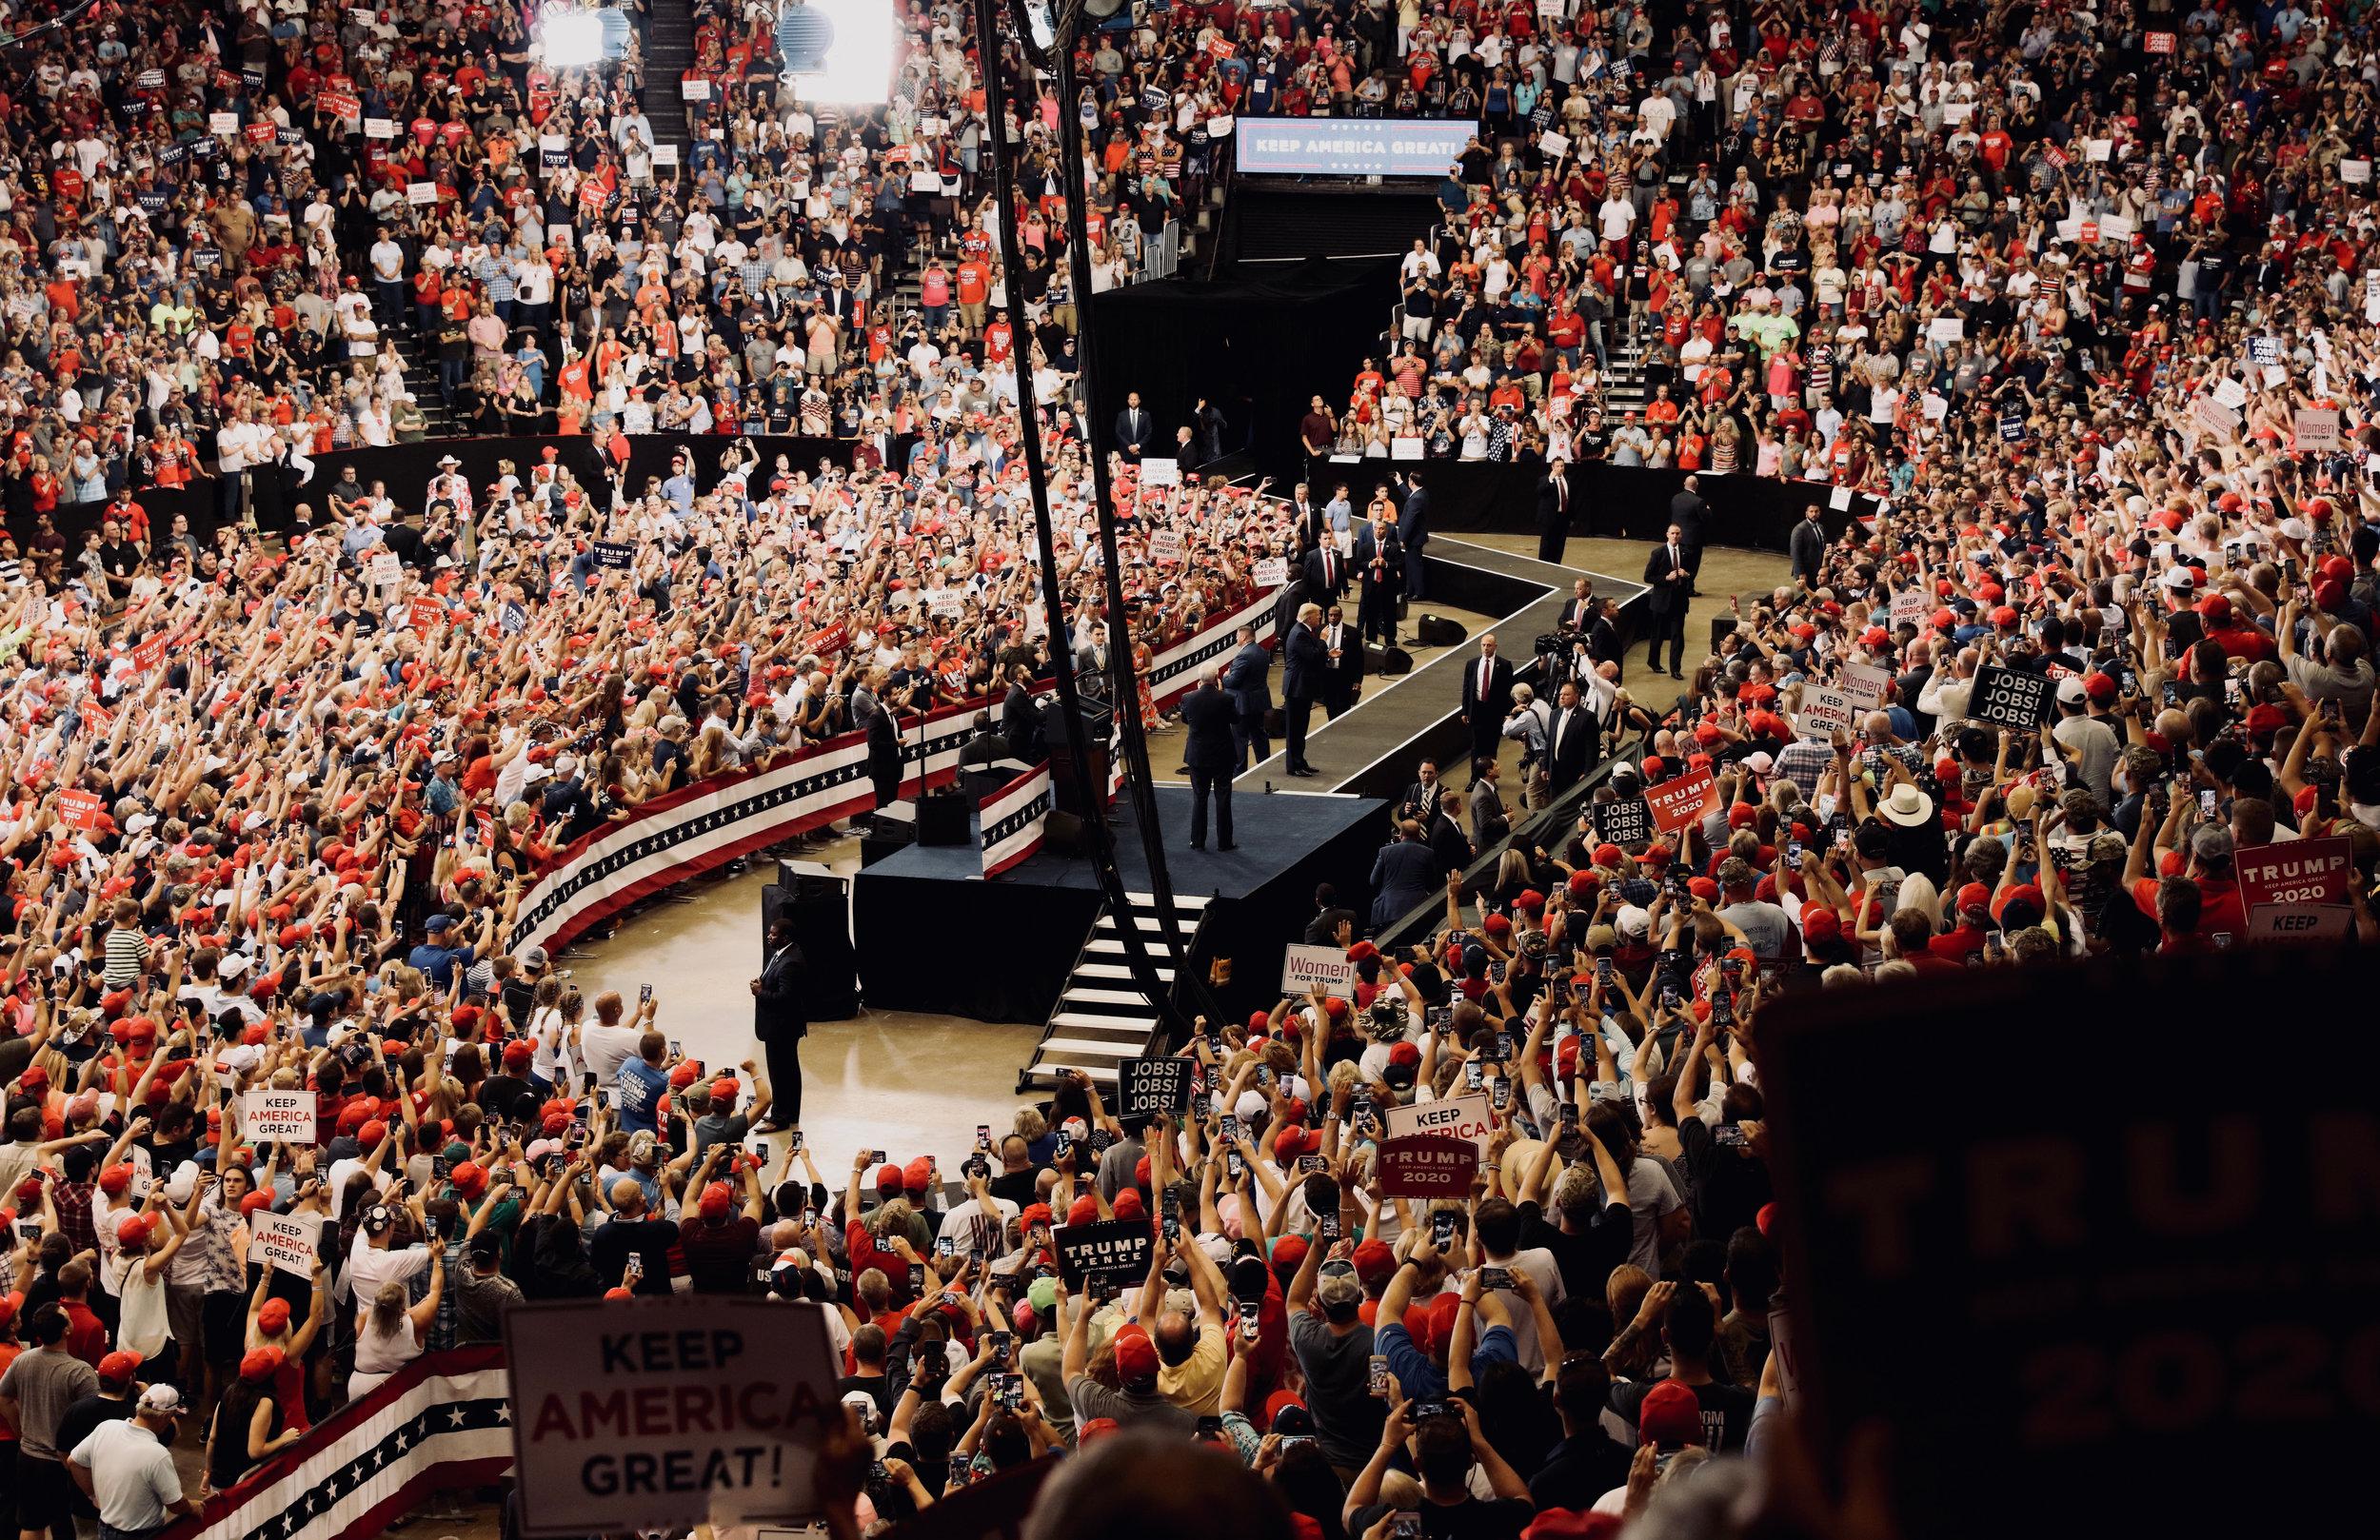 Andy Grant - Trump Rally 8.1.1988.jpg